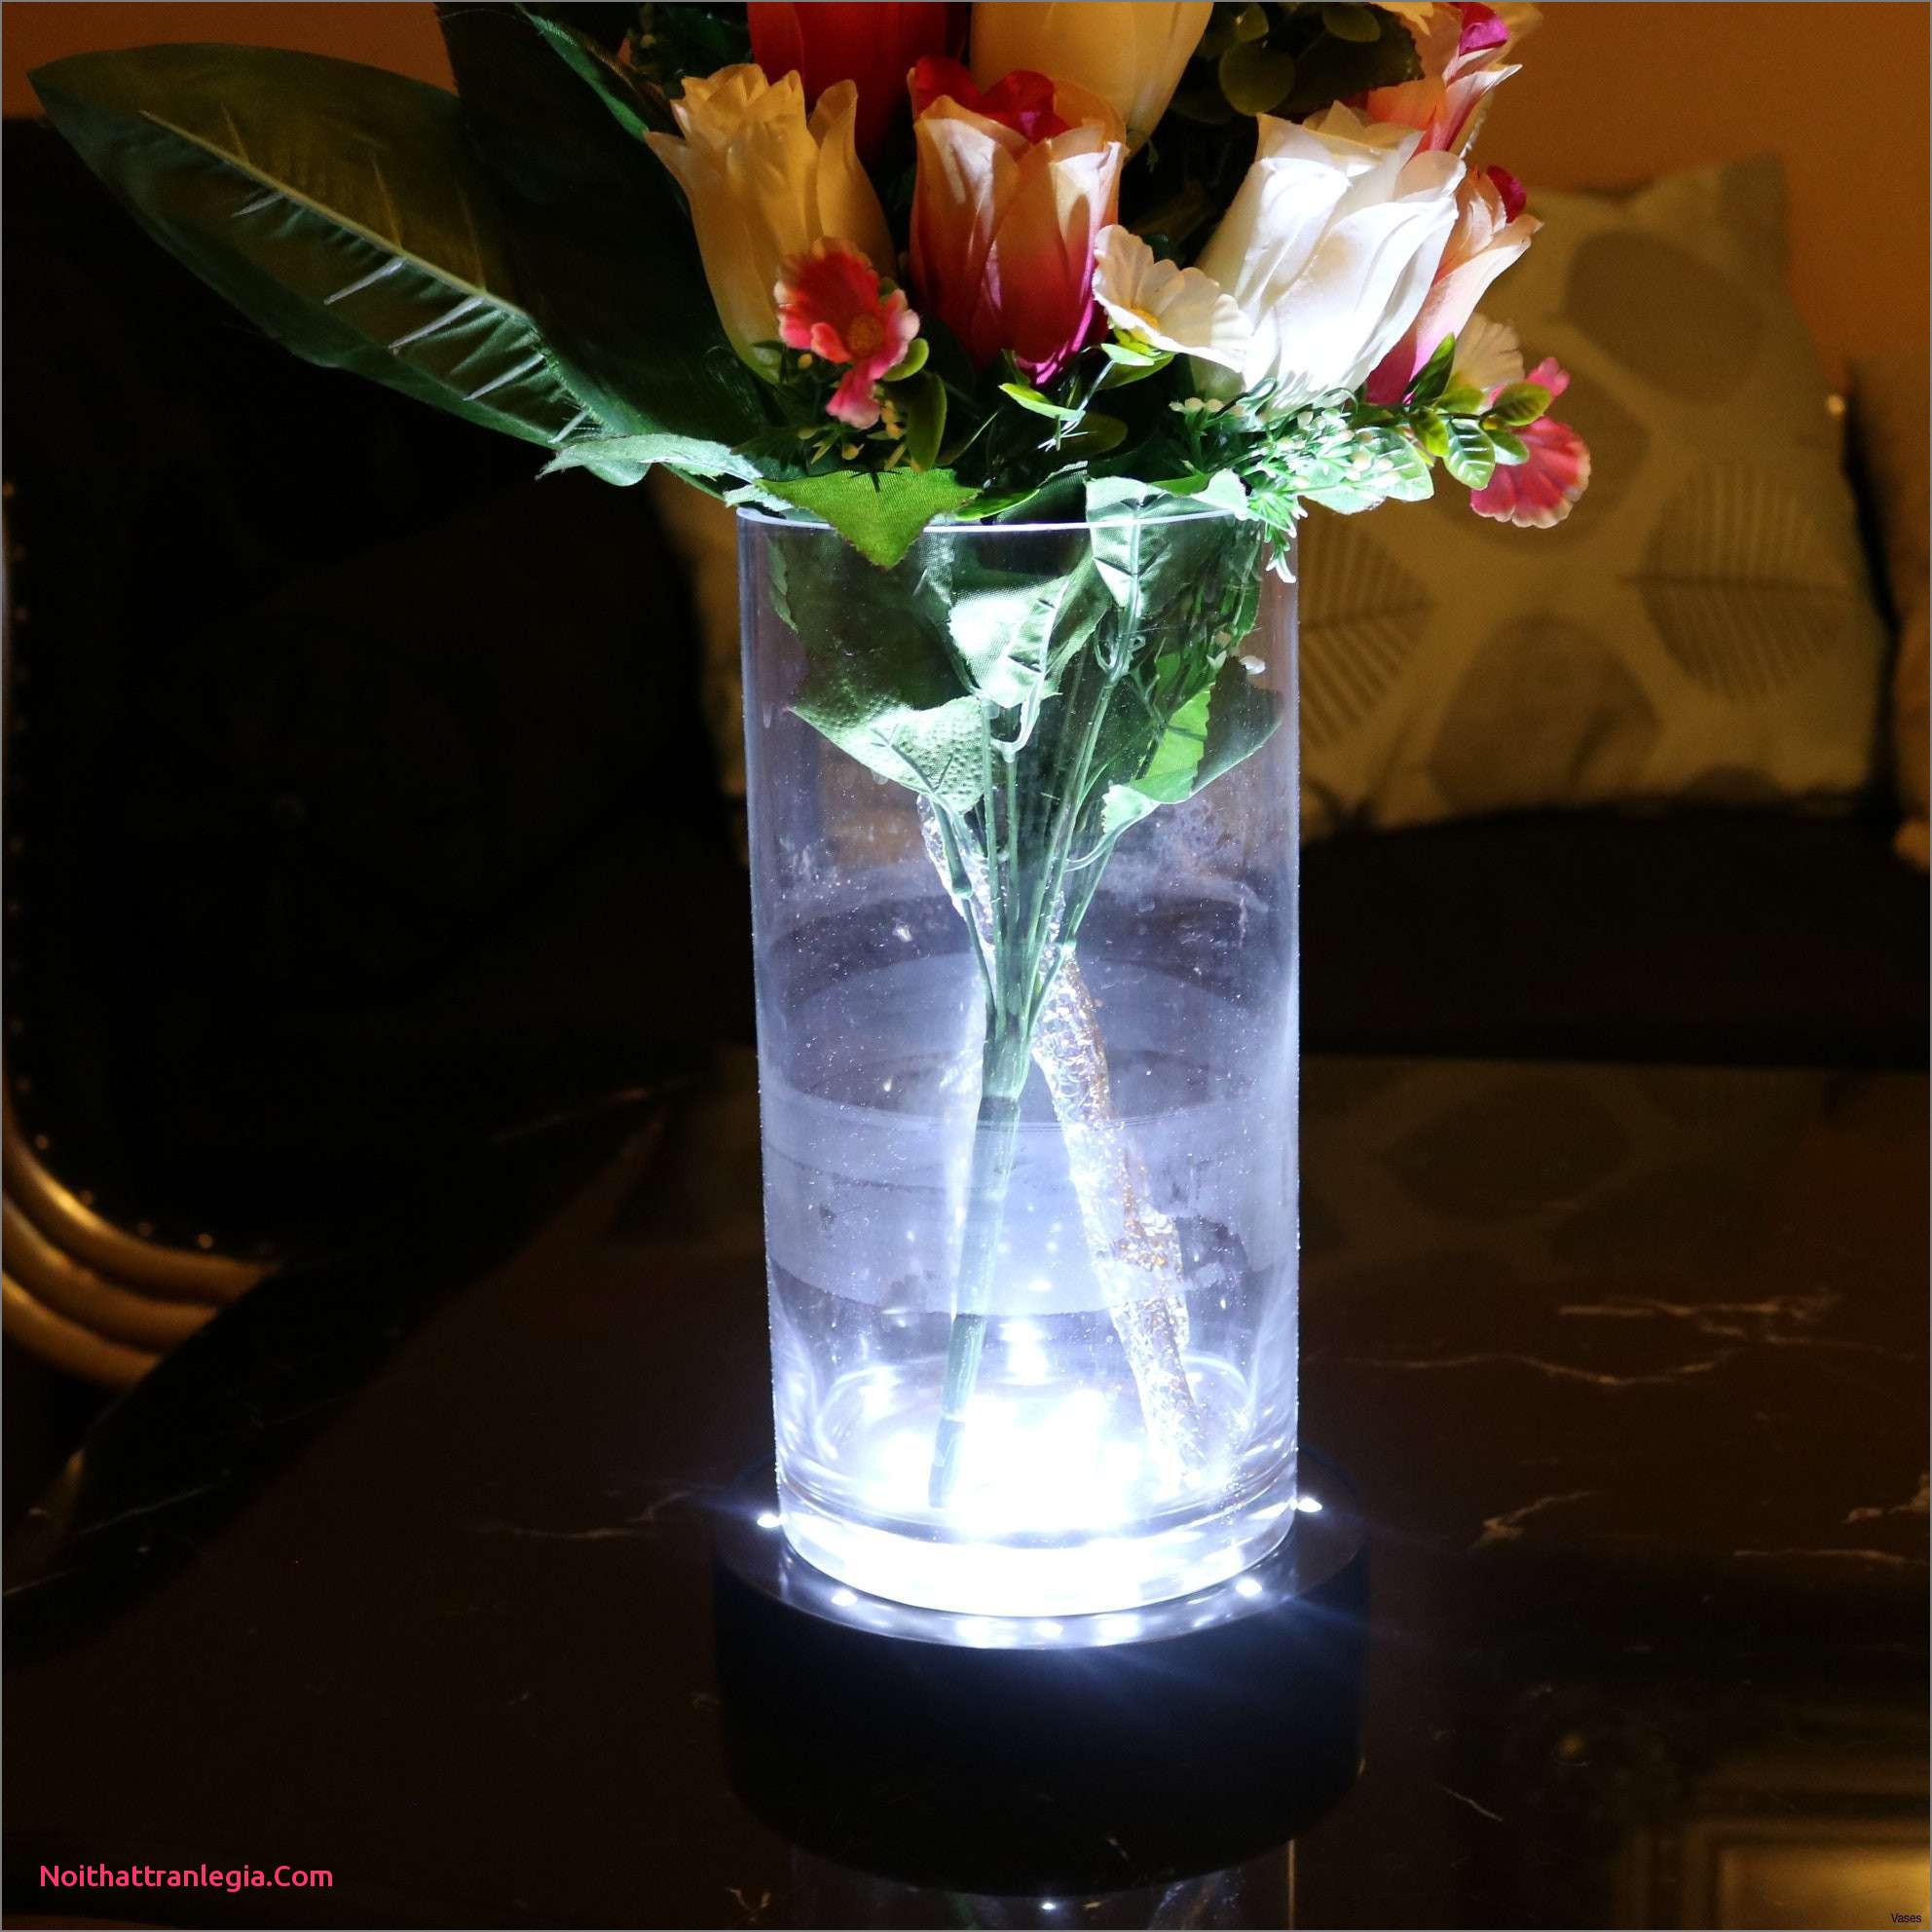 small colored glass vases of 20 cut glass antique vase noithattranlegia vases design in glass wall vases gallery vases disposable plastic single cheap flower rose vasei 0d design glass